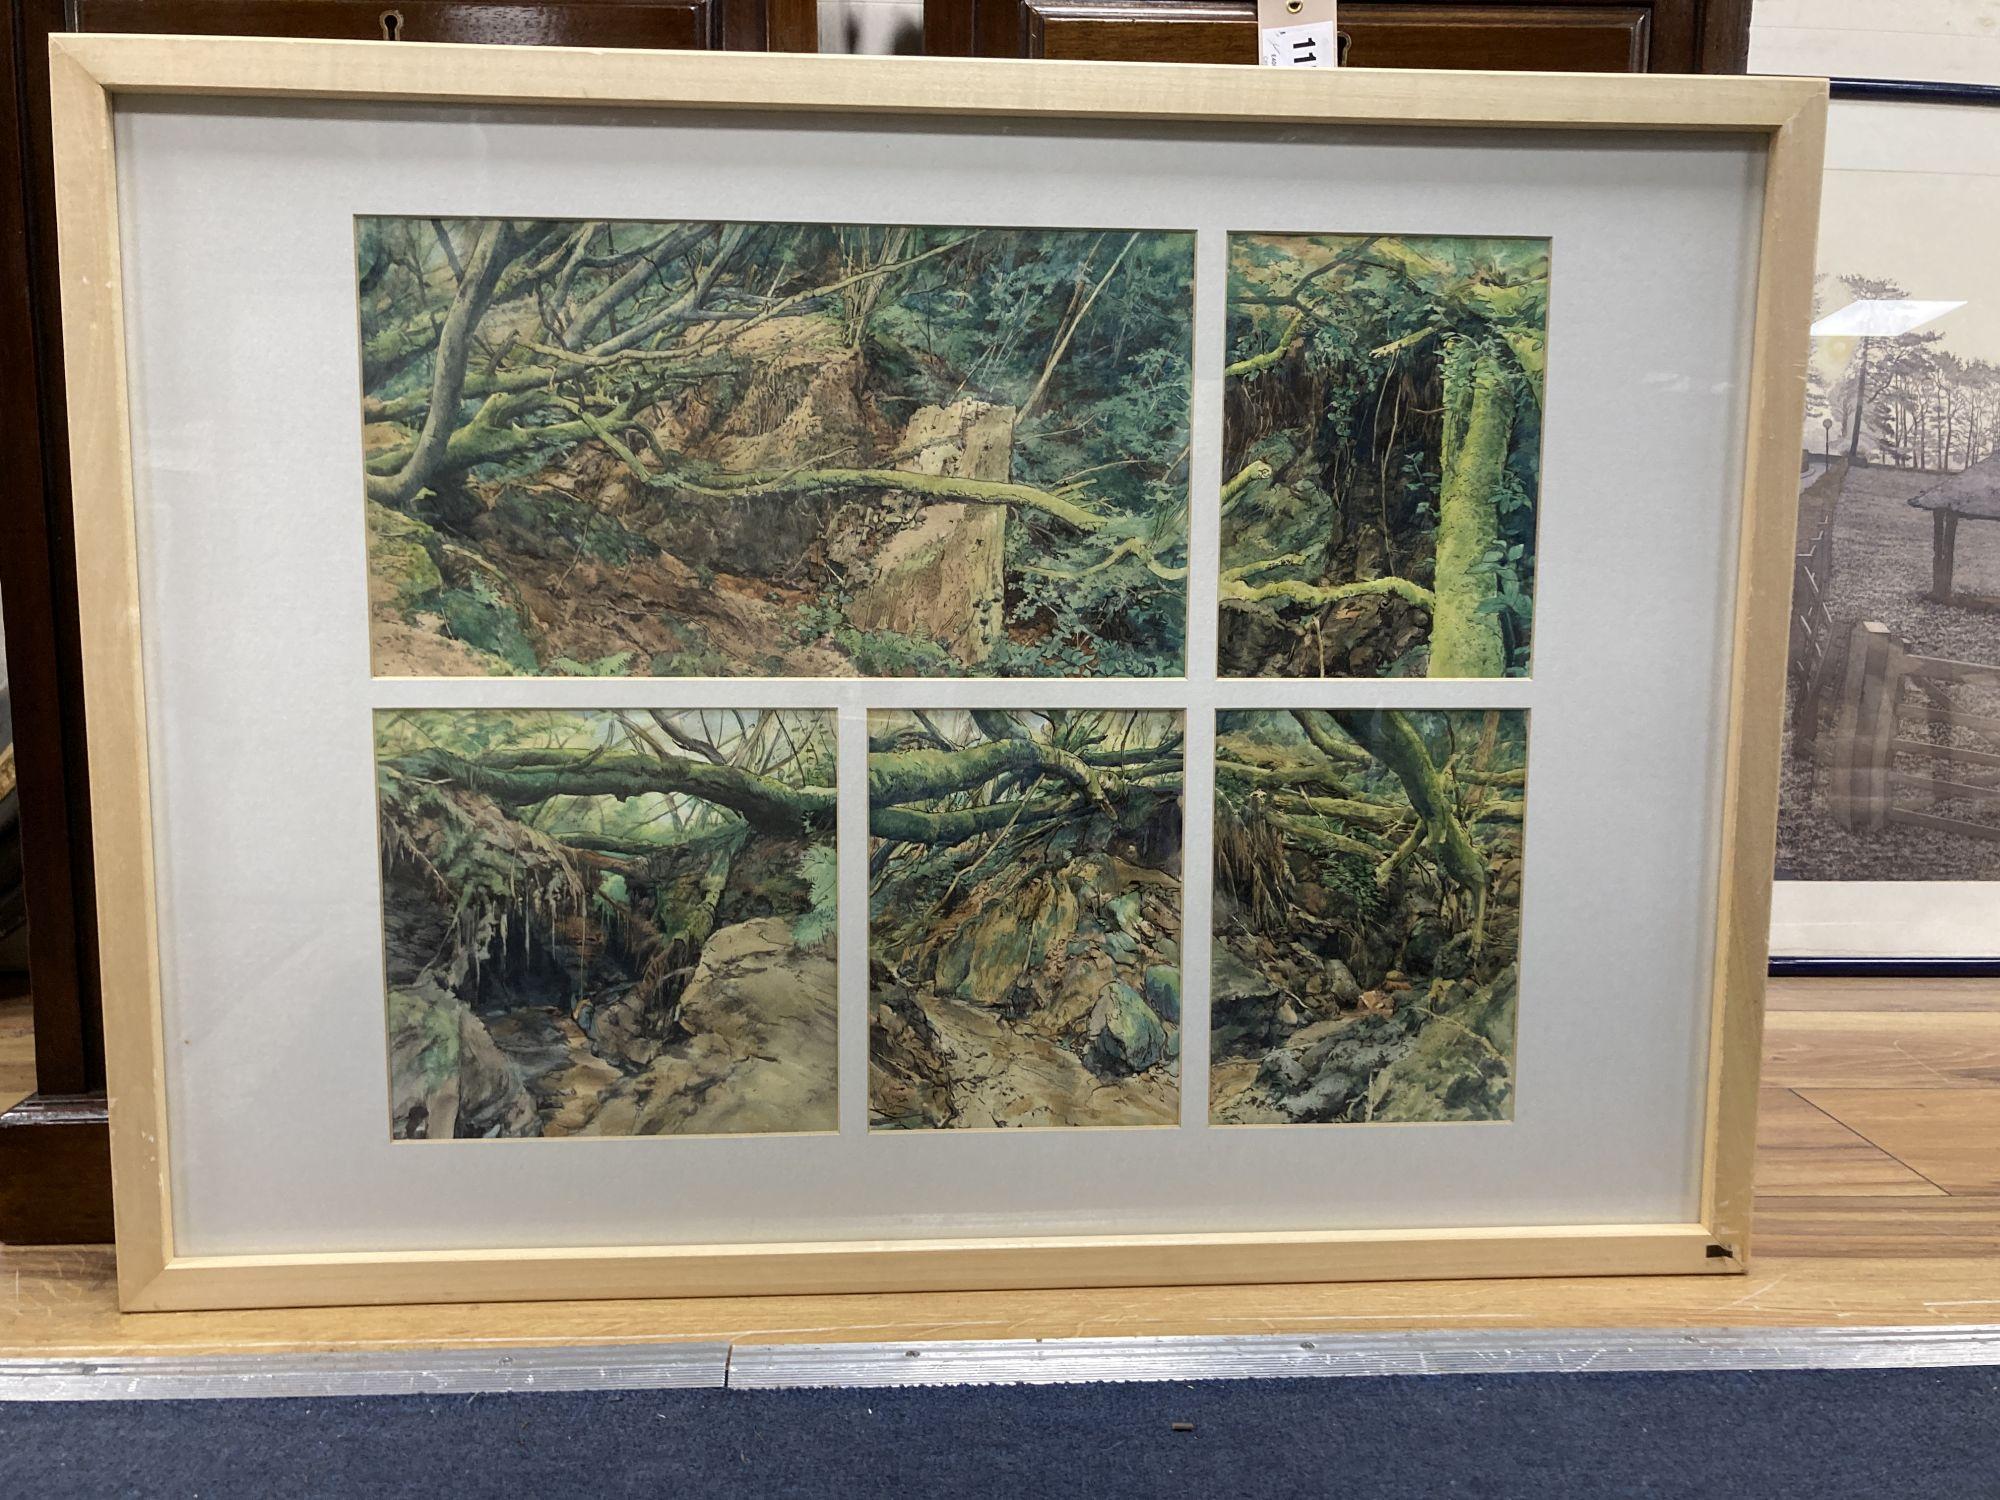 John Wiltshire (1969-), watercolour, 5 studies of the Tank Bridge, Bankside Gallery label verso, - Image 2 of 3